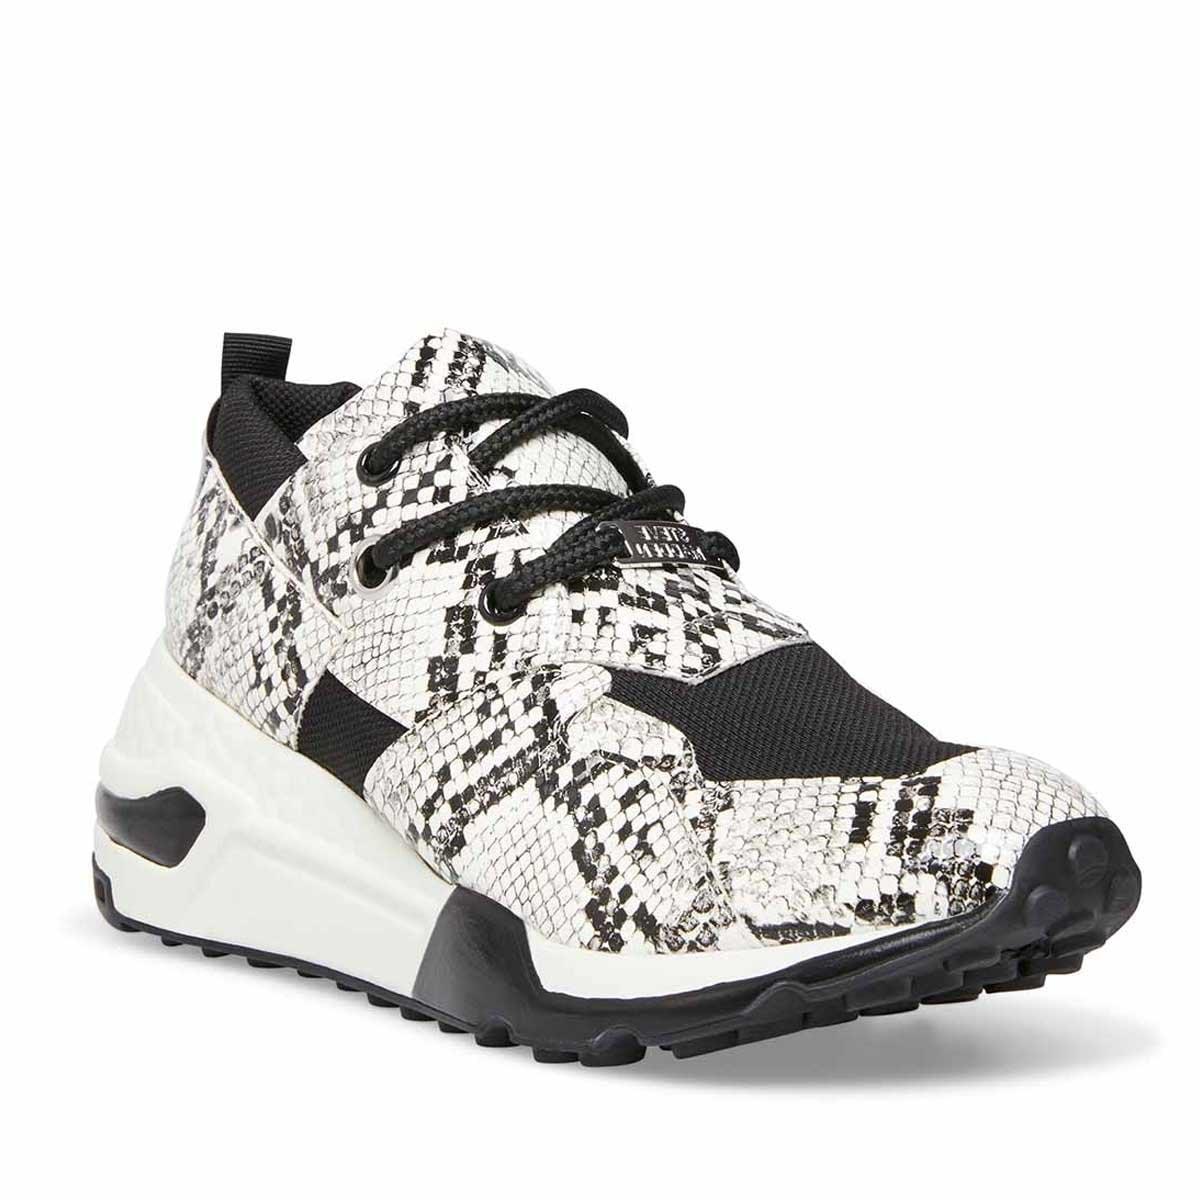 Resultado de imagen de ugly sneakers steve madden